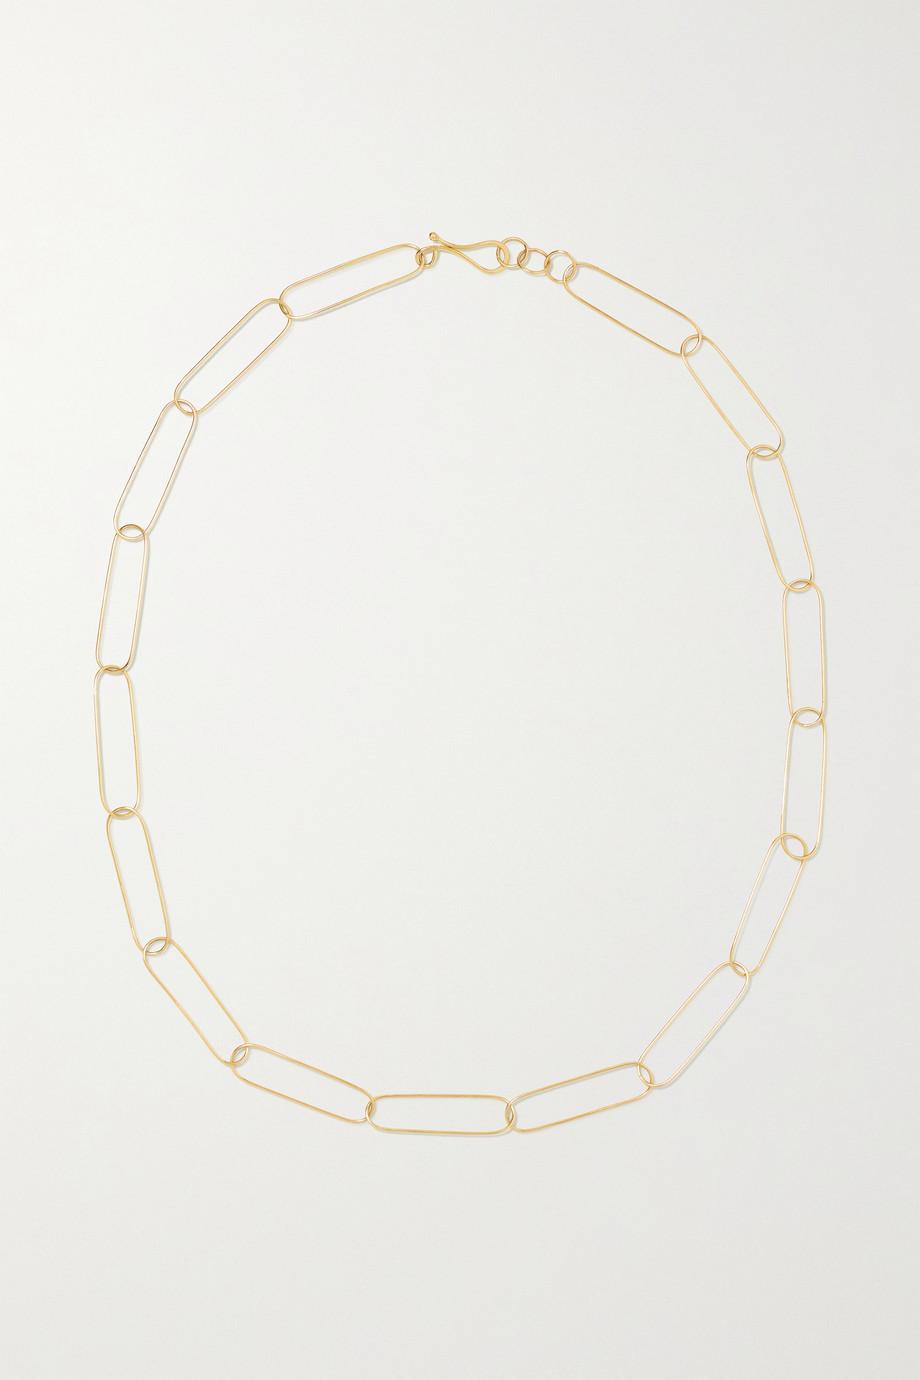 Melissa Joy Manning Kette aus recyceltem 14 Karat Gold